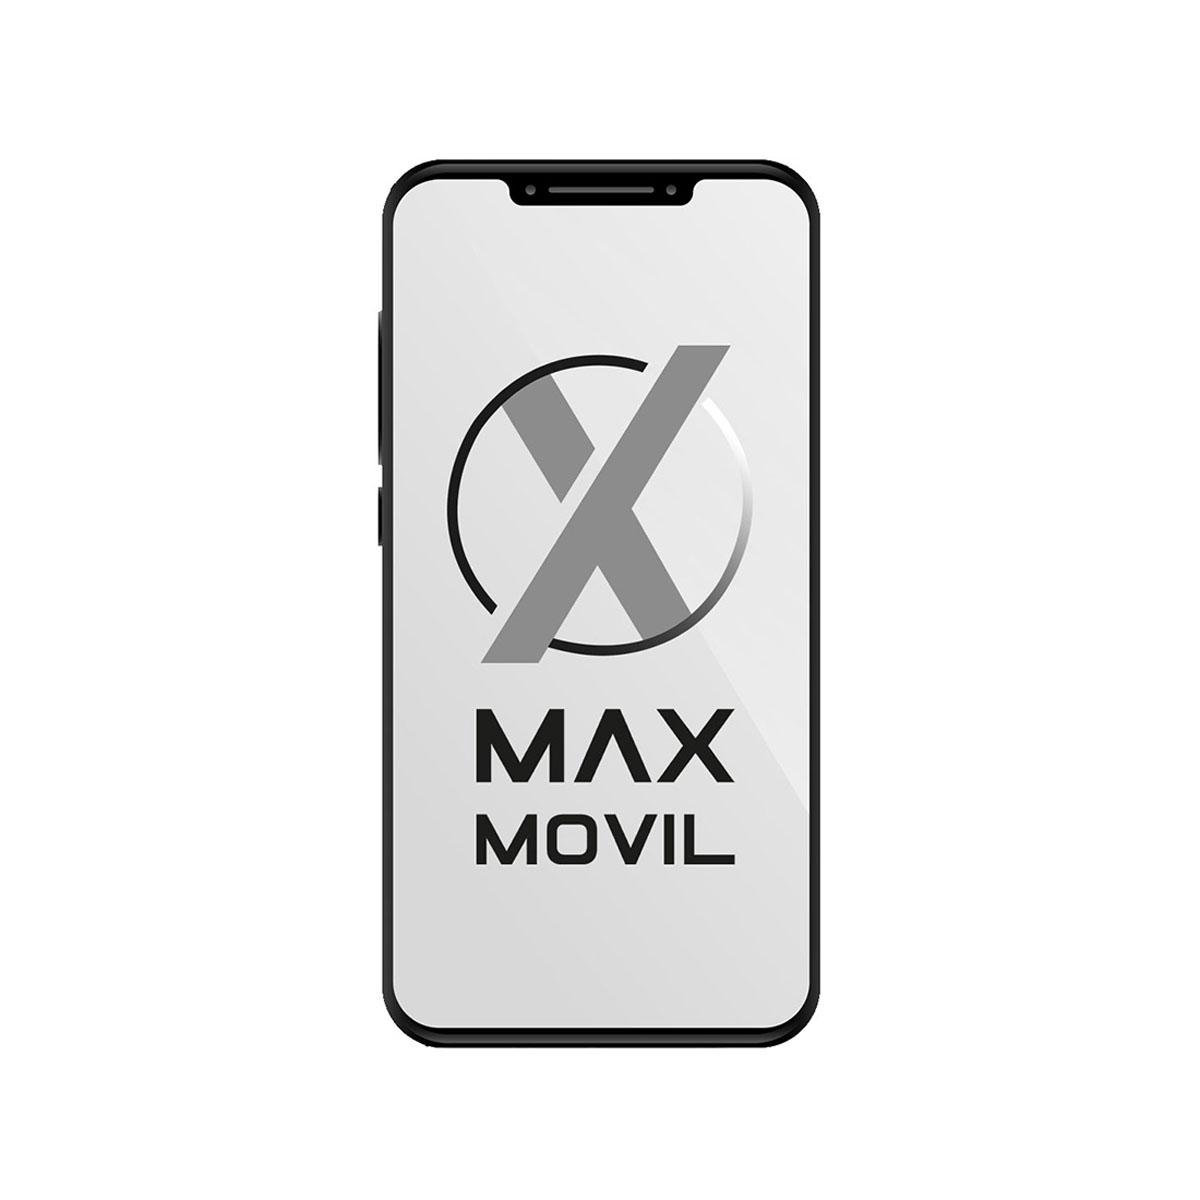 Protector de pantalla de cristal templado para iPhone XR